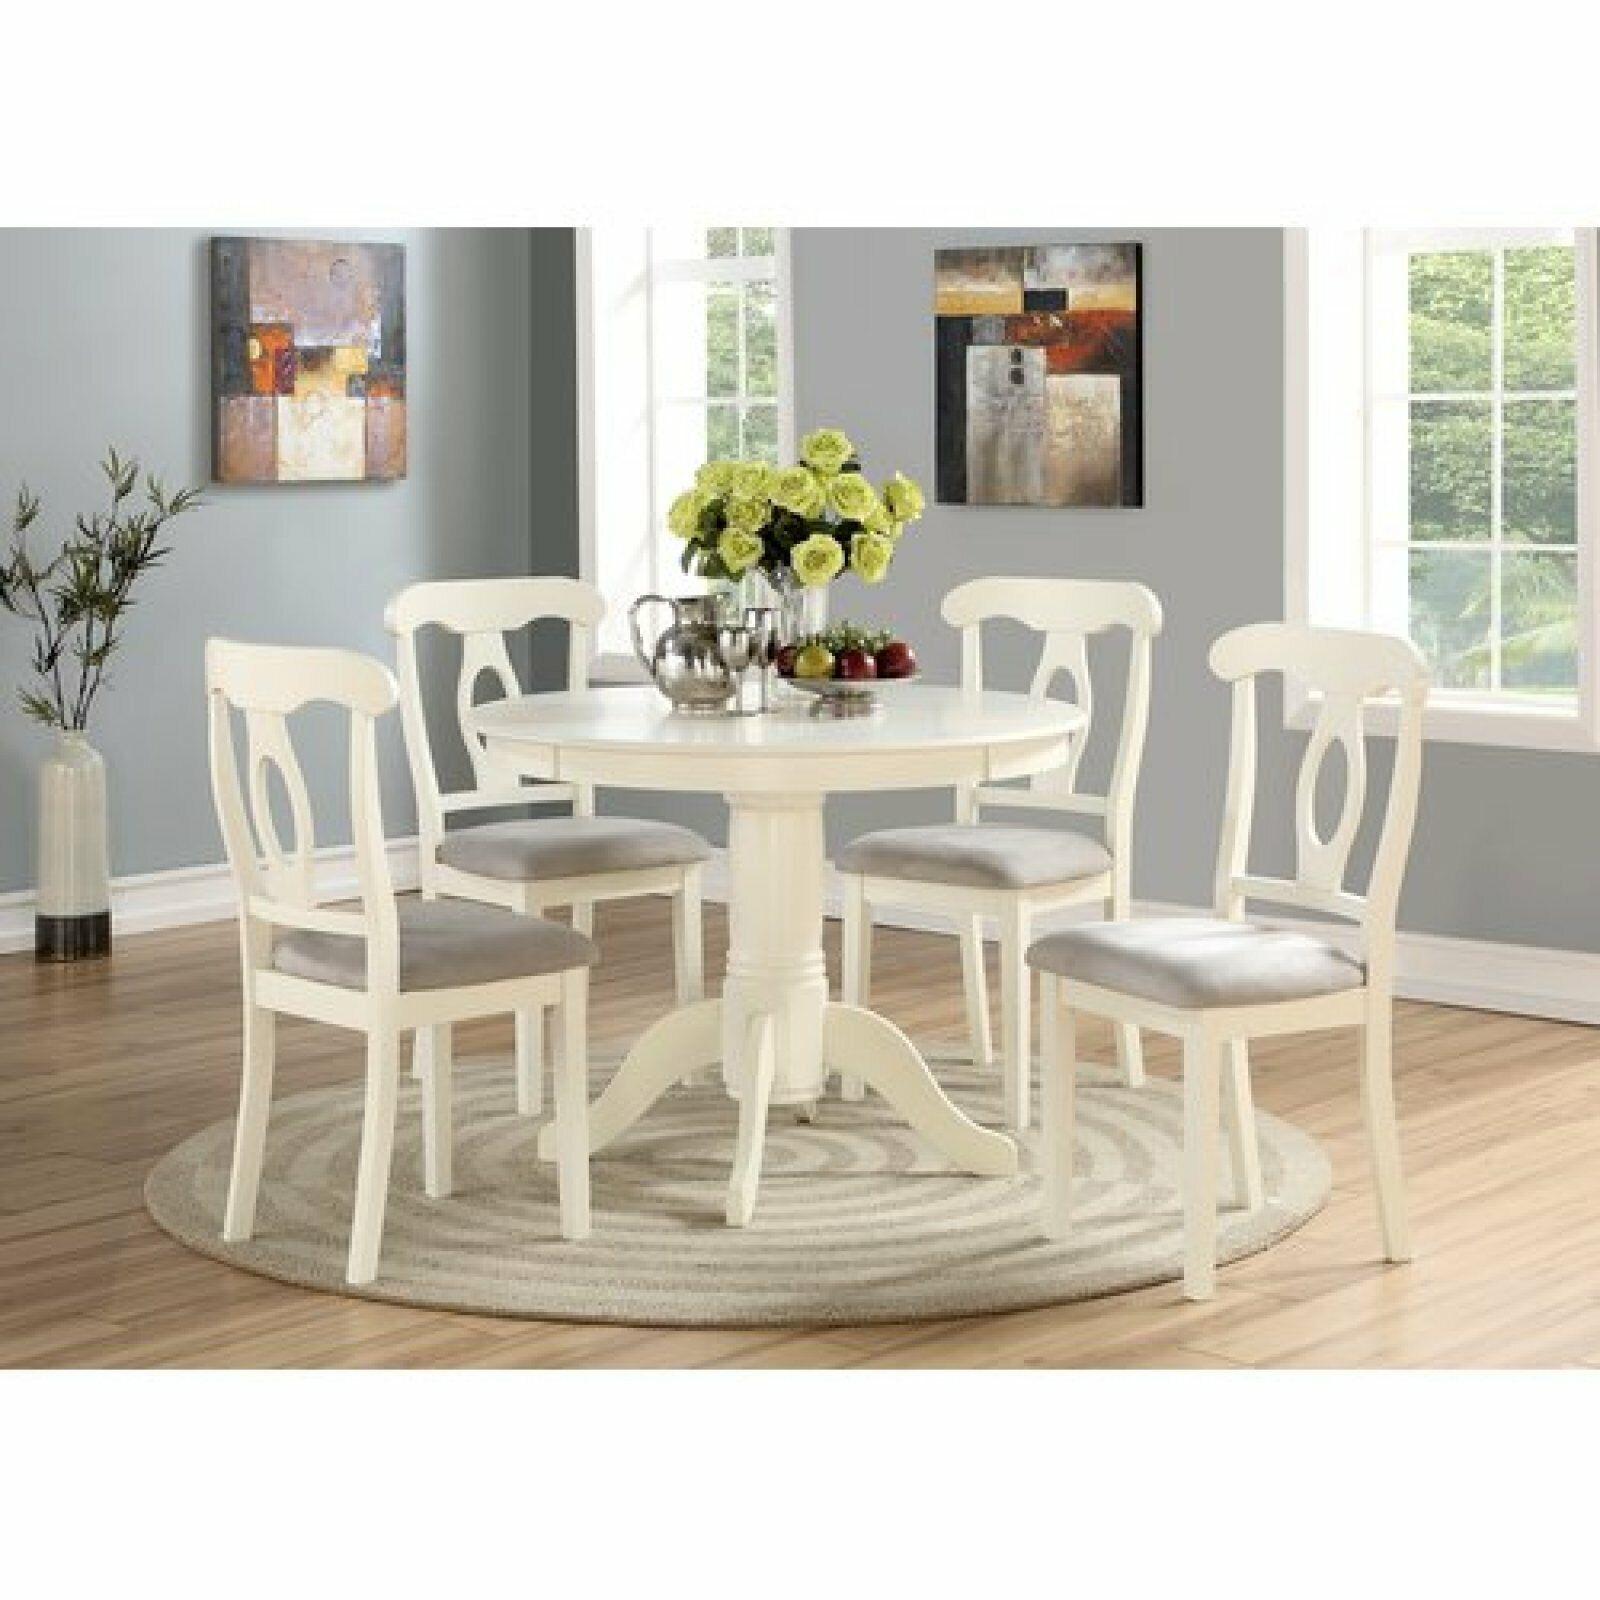 White Wooden Kitchen Furniture Tables